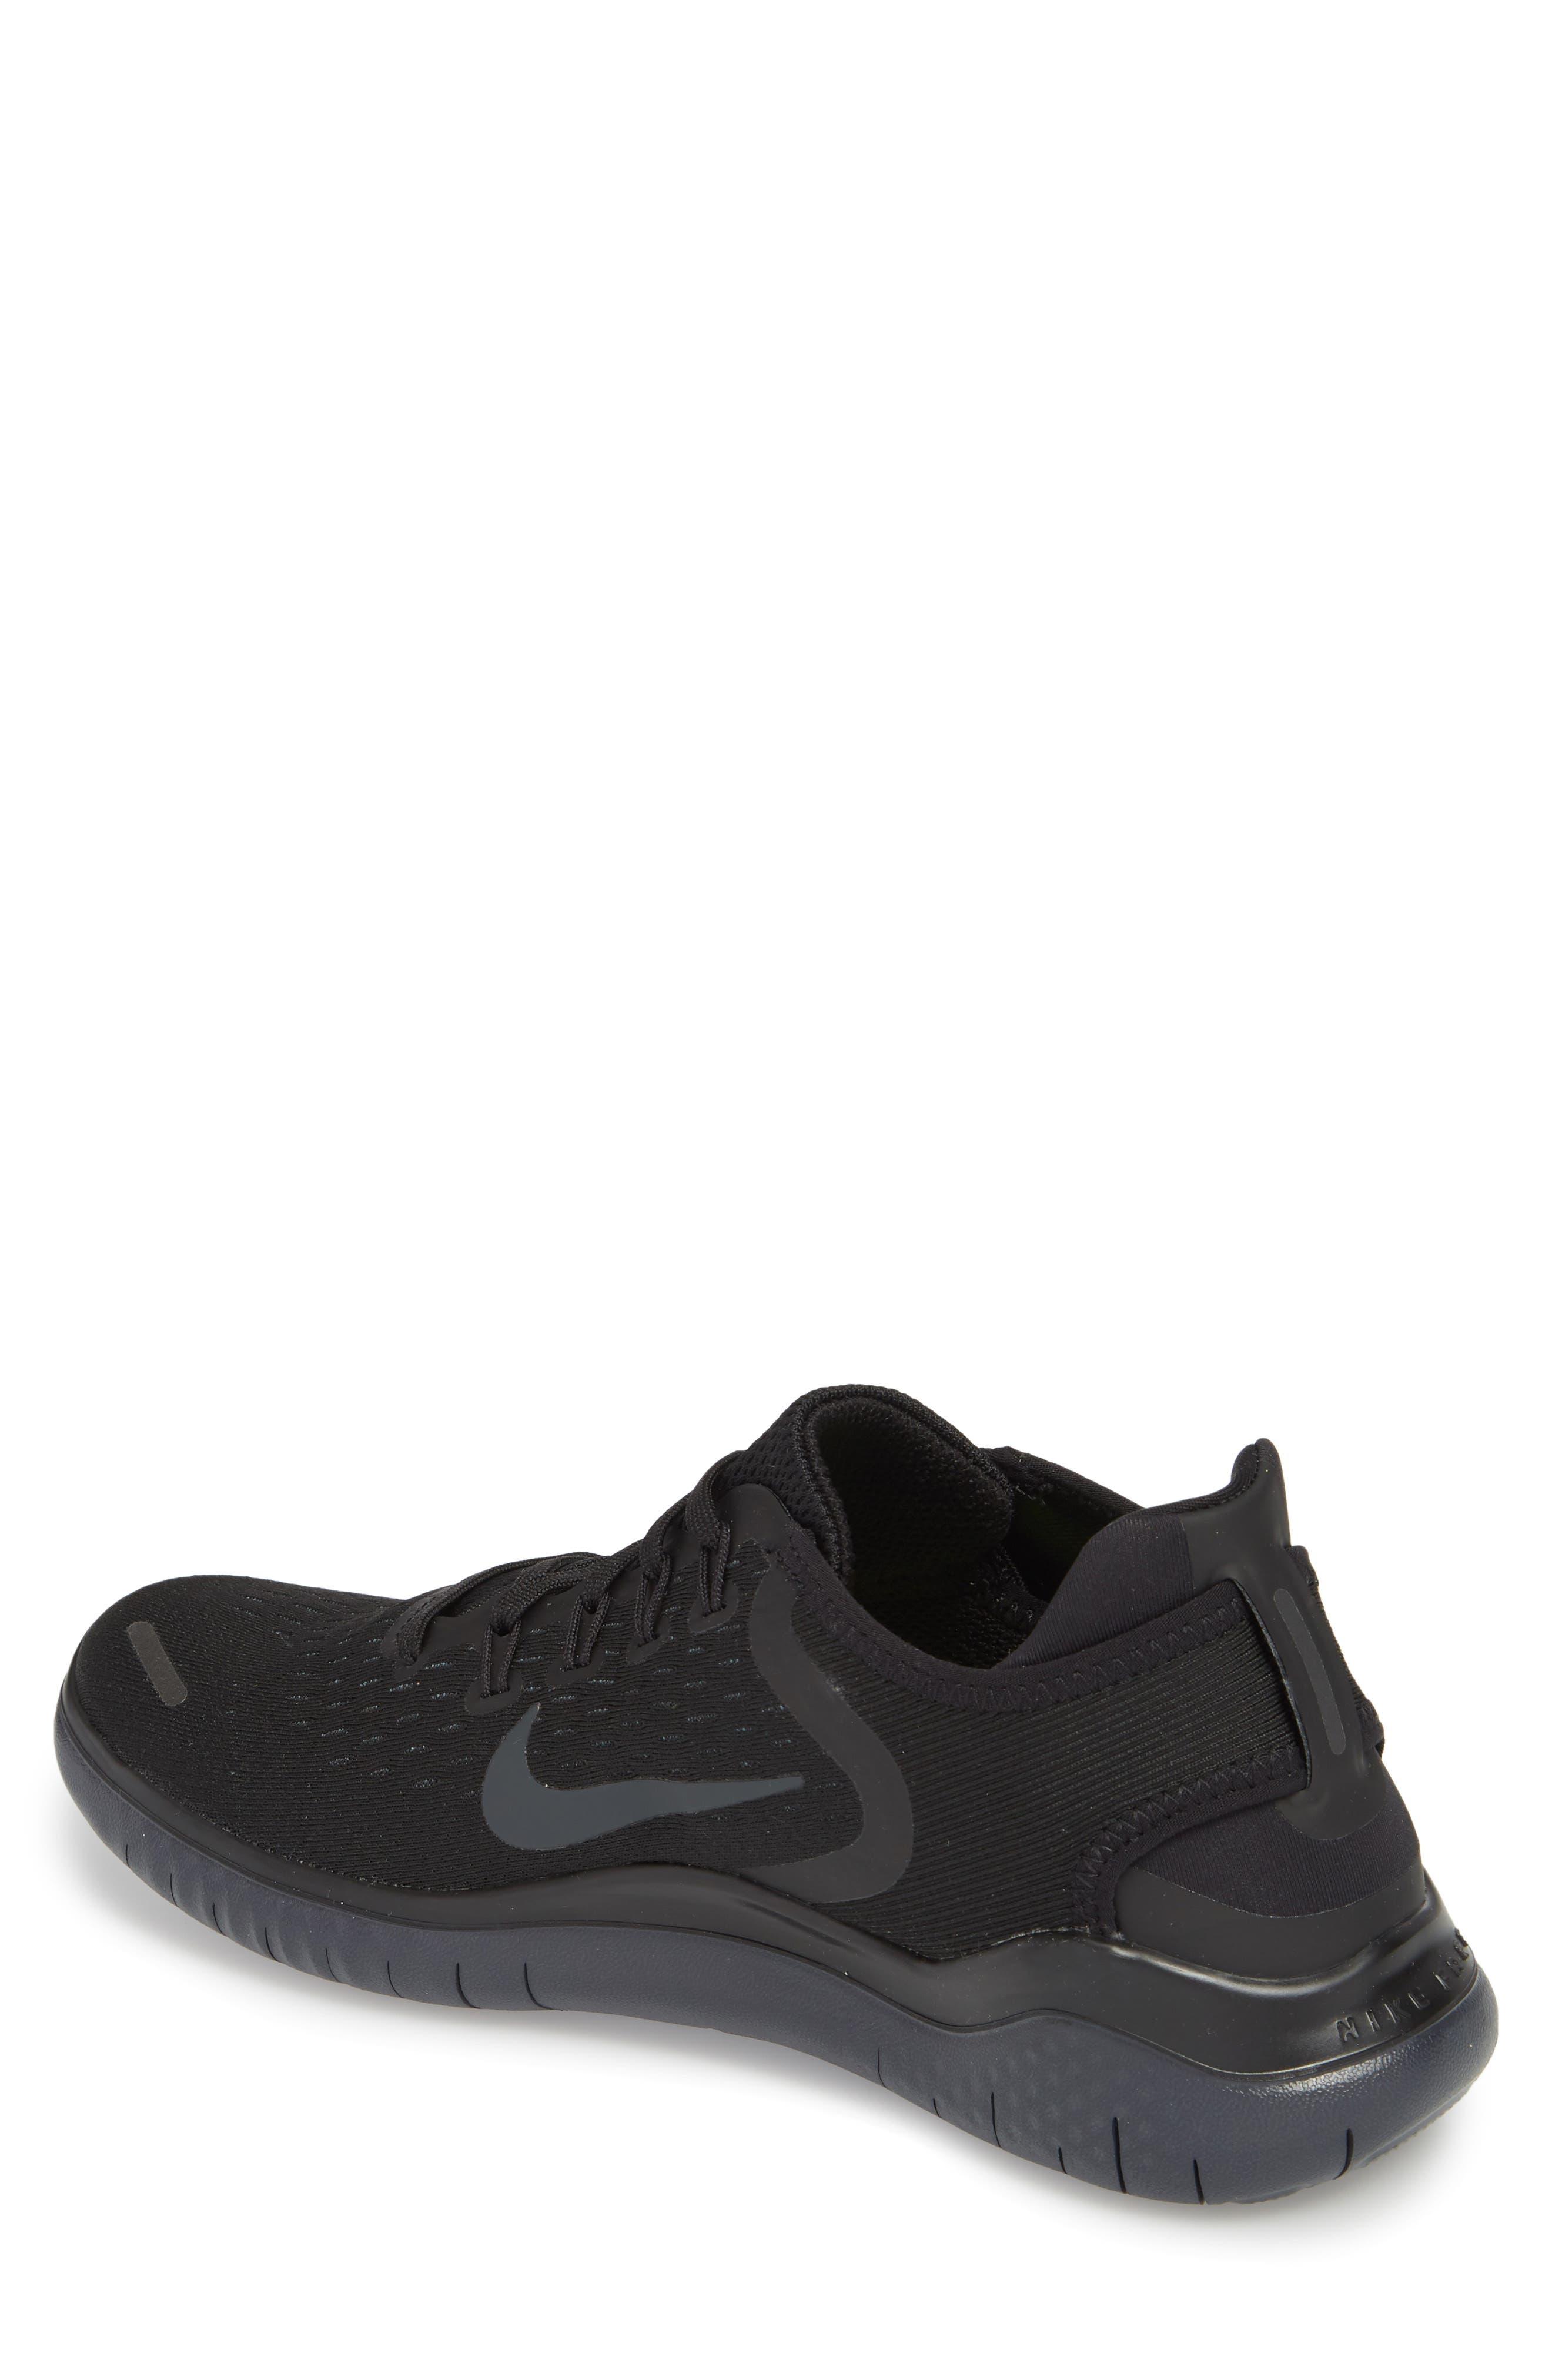 Free RN 2018 Running Shoe,                             Alternate thumbnail 2, color,                             Black/ Anthracite